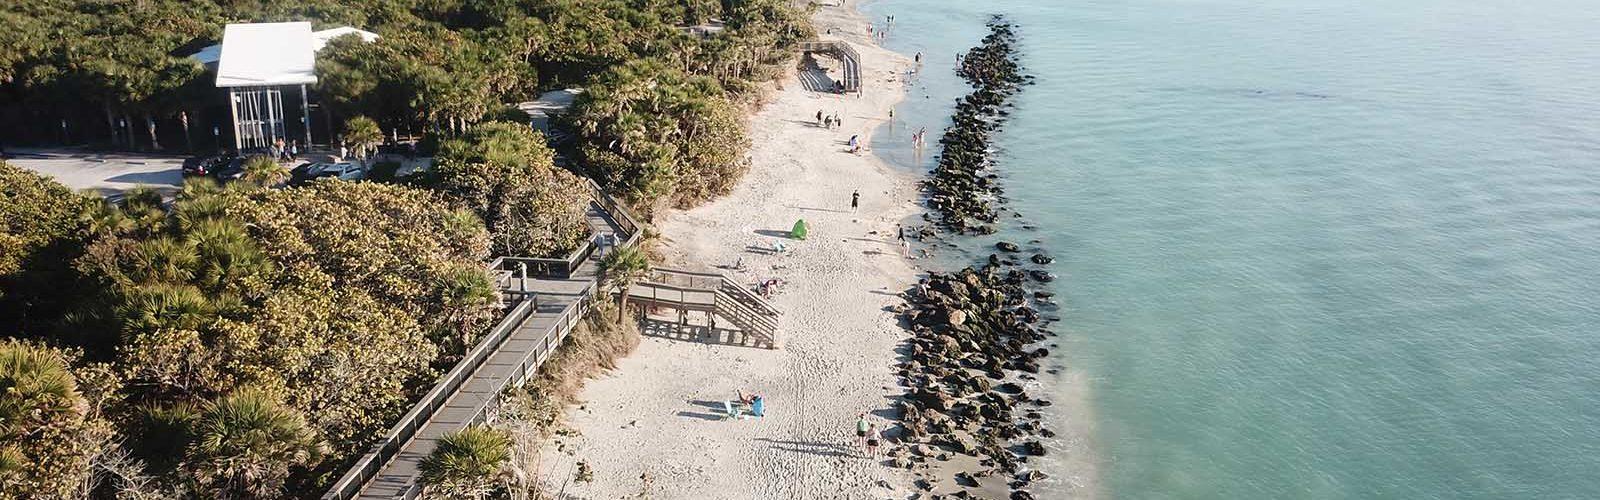 caspersen-beach-venice-fossiles-une